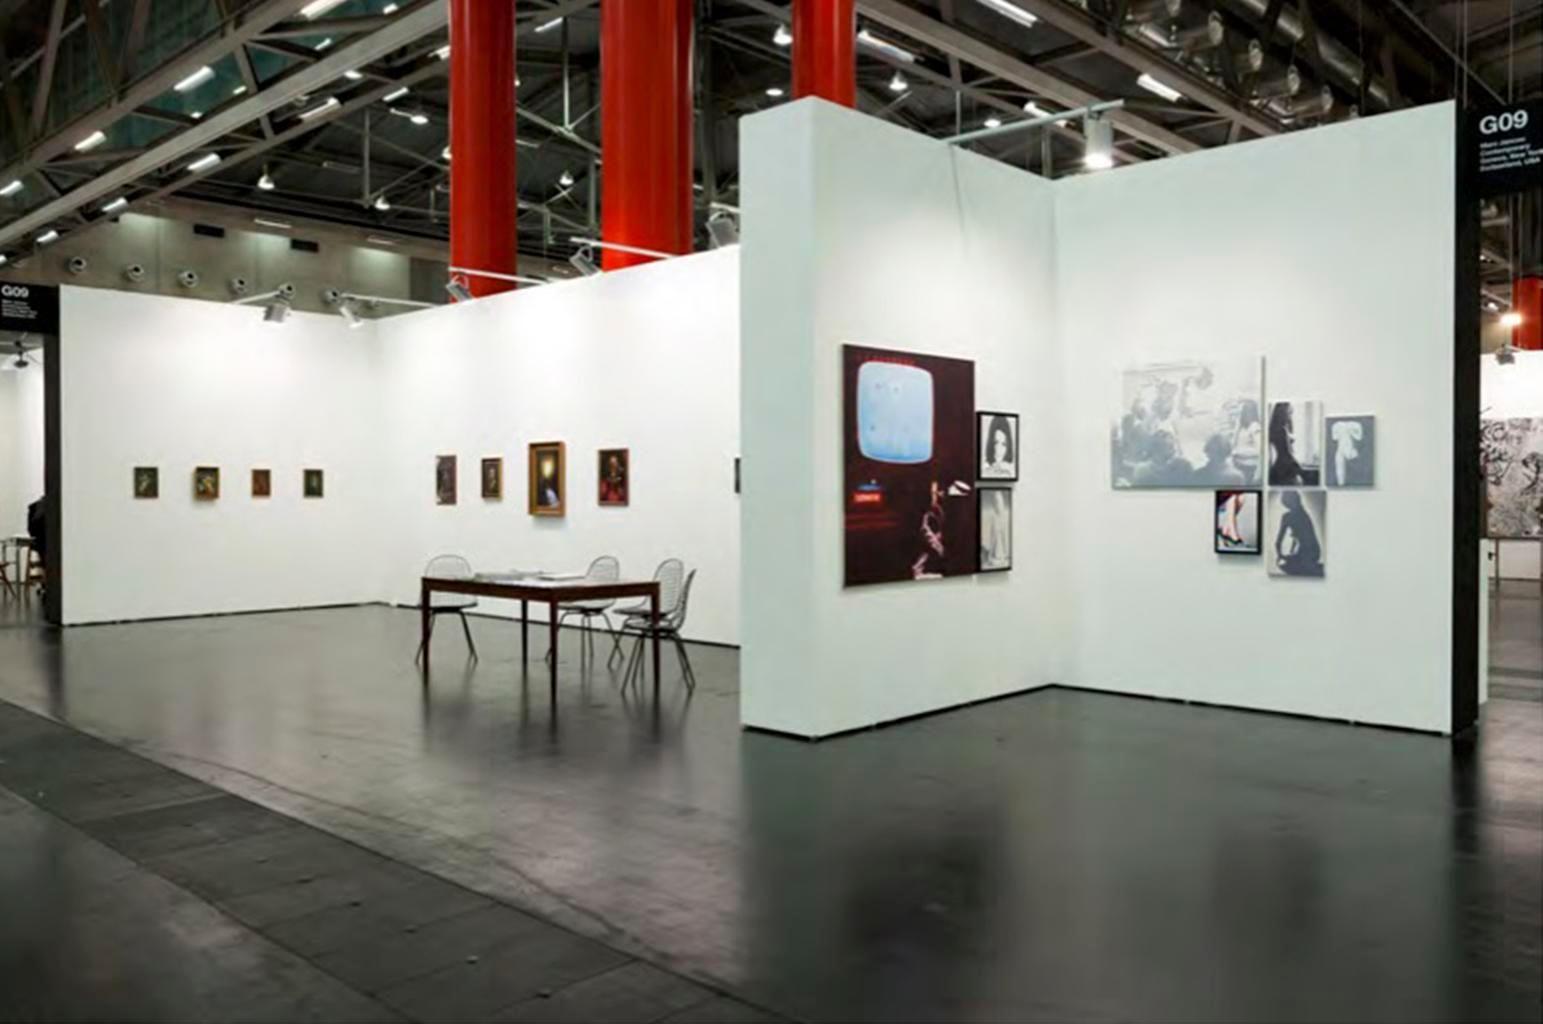 Installation view, Marc Jancou at Viennafair, September 20 - 23, 2013, Slawomir Elsner: Panorama